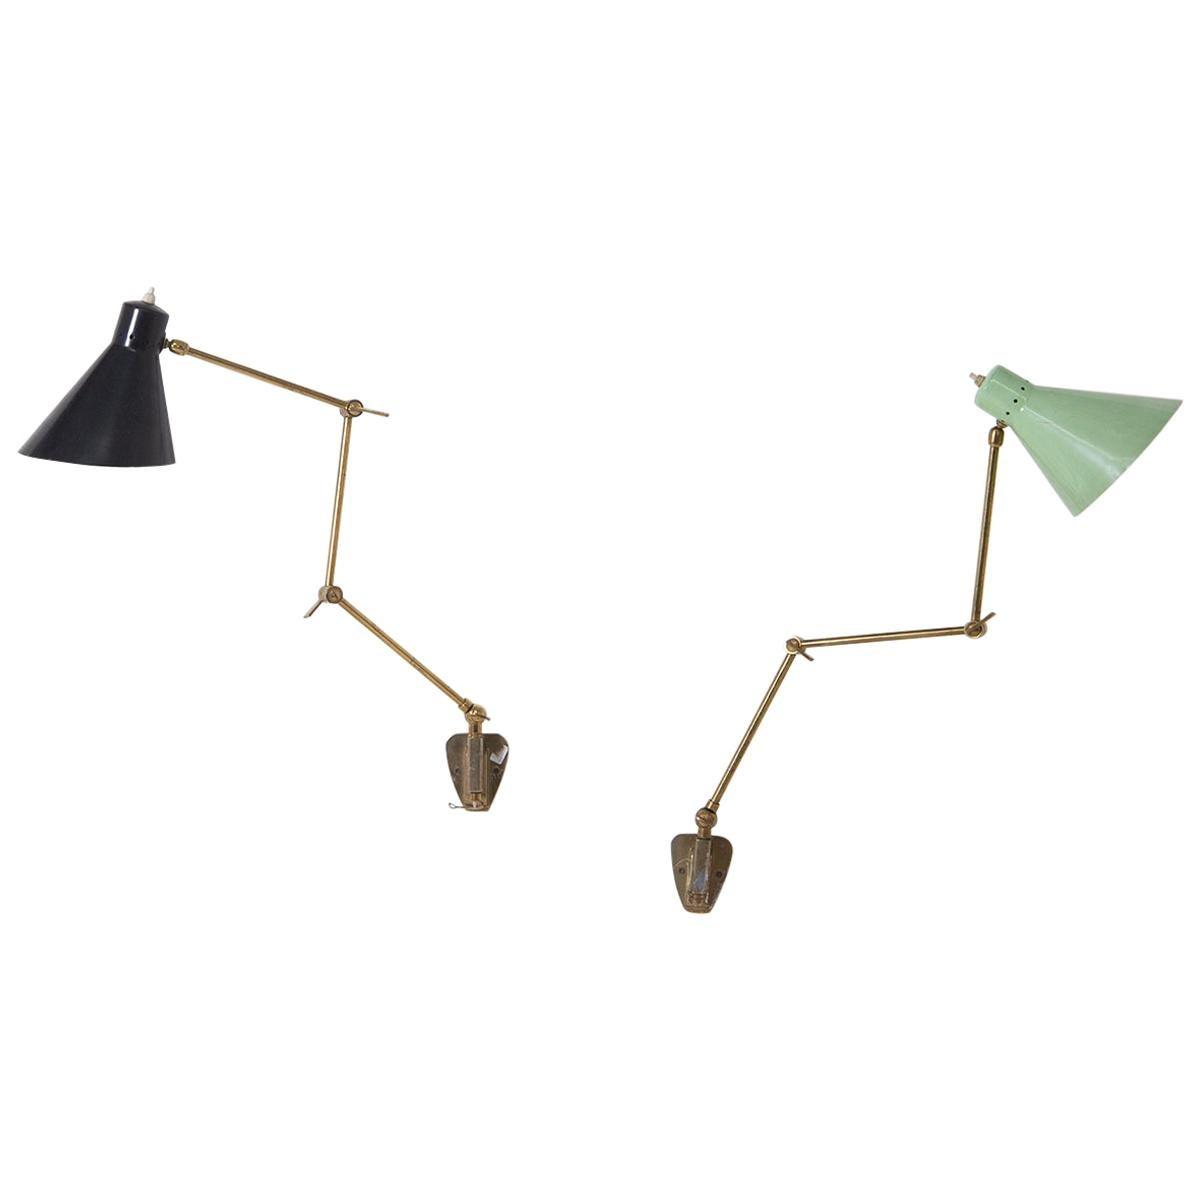 Stilnovo Italian Wall Lamp in Brass and Aluminium Green and Black, 1950s